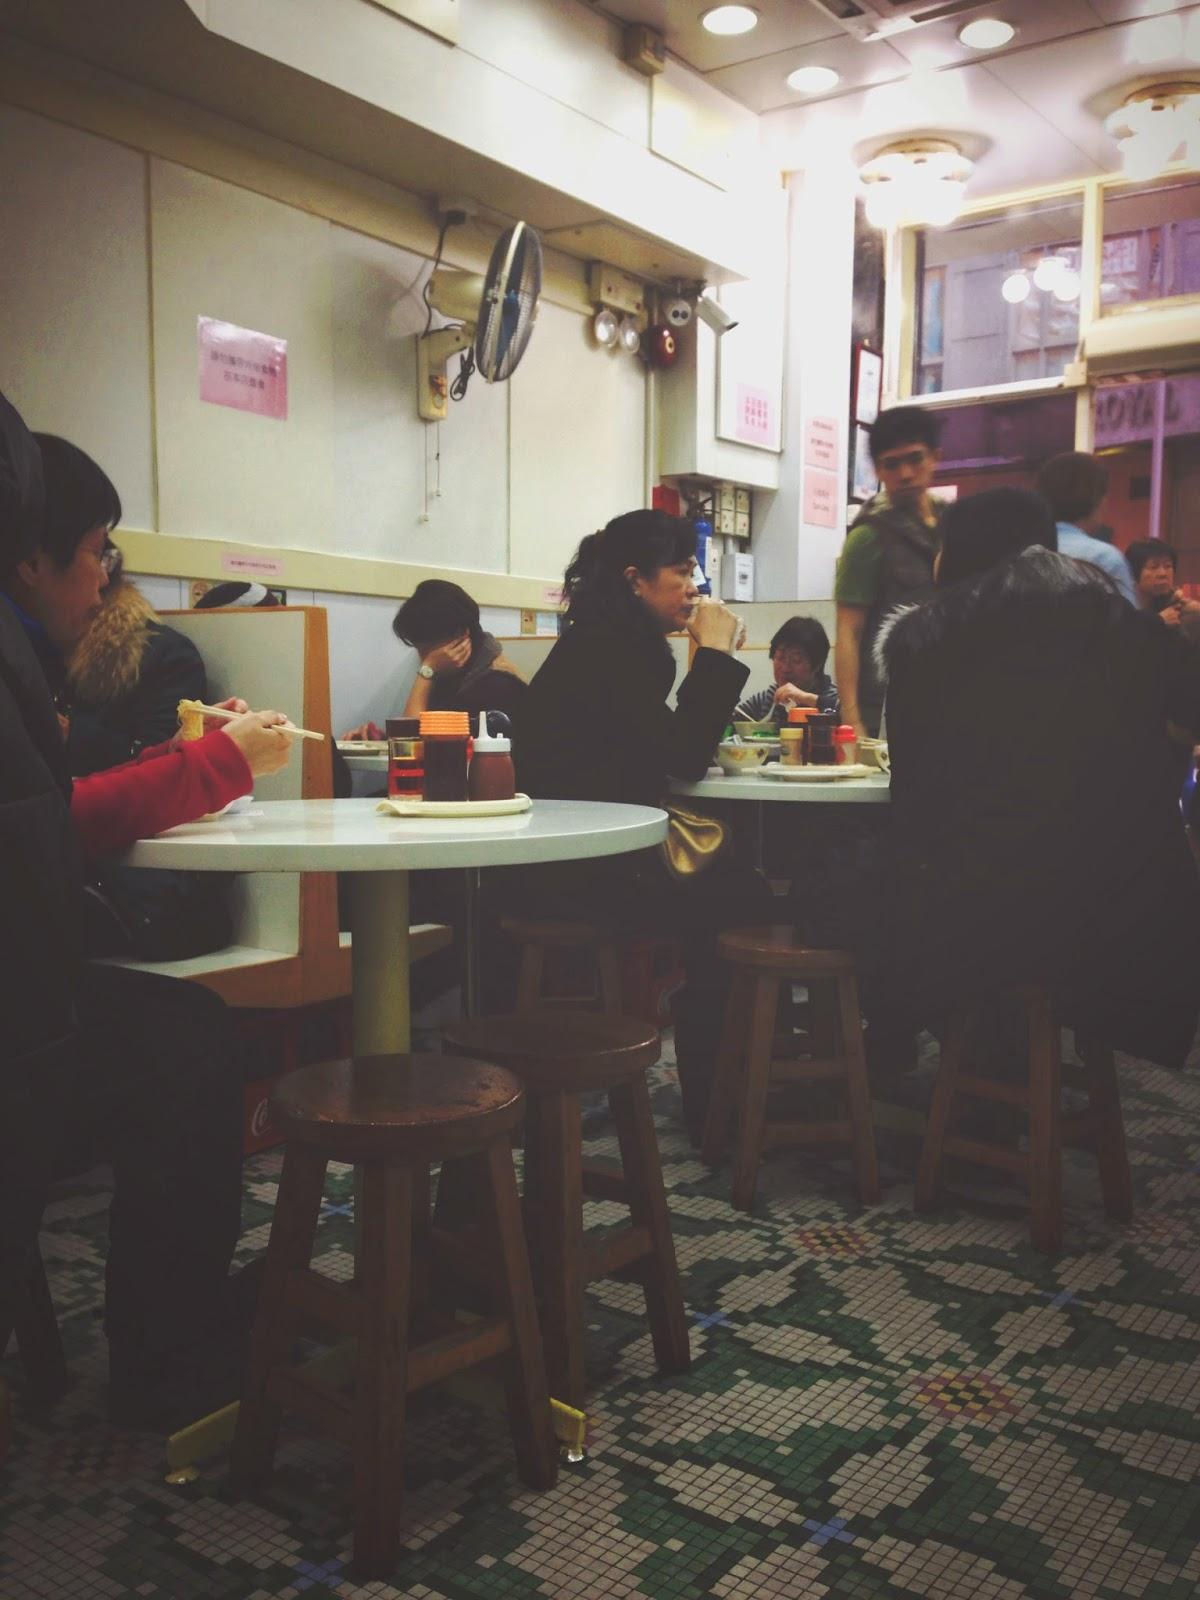 Mak Man Kee Noodle Shop Interior Parkes St, Jordan, Hong Kong